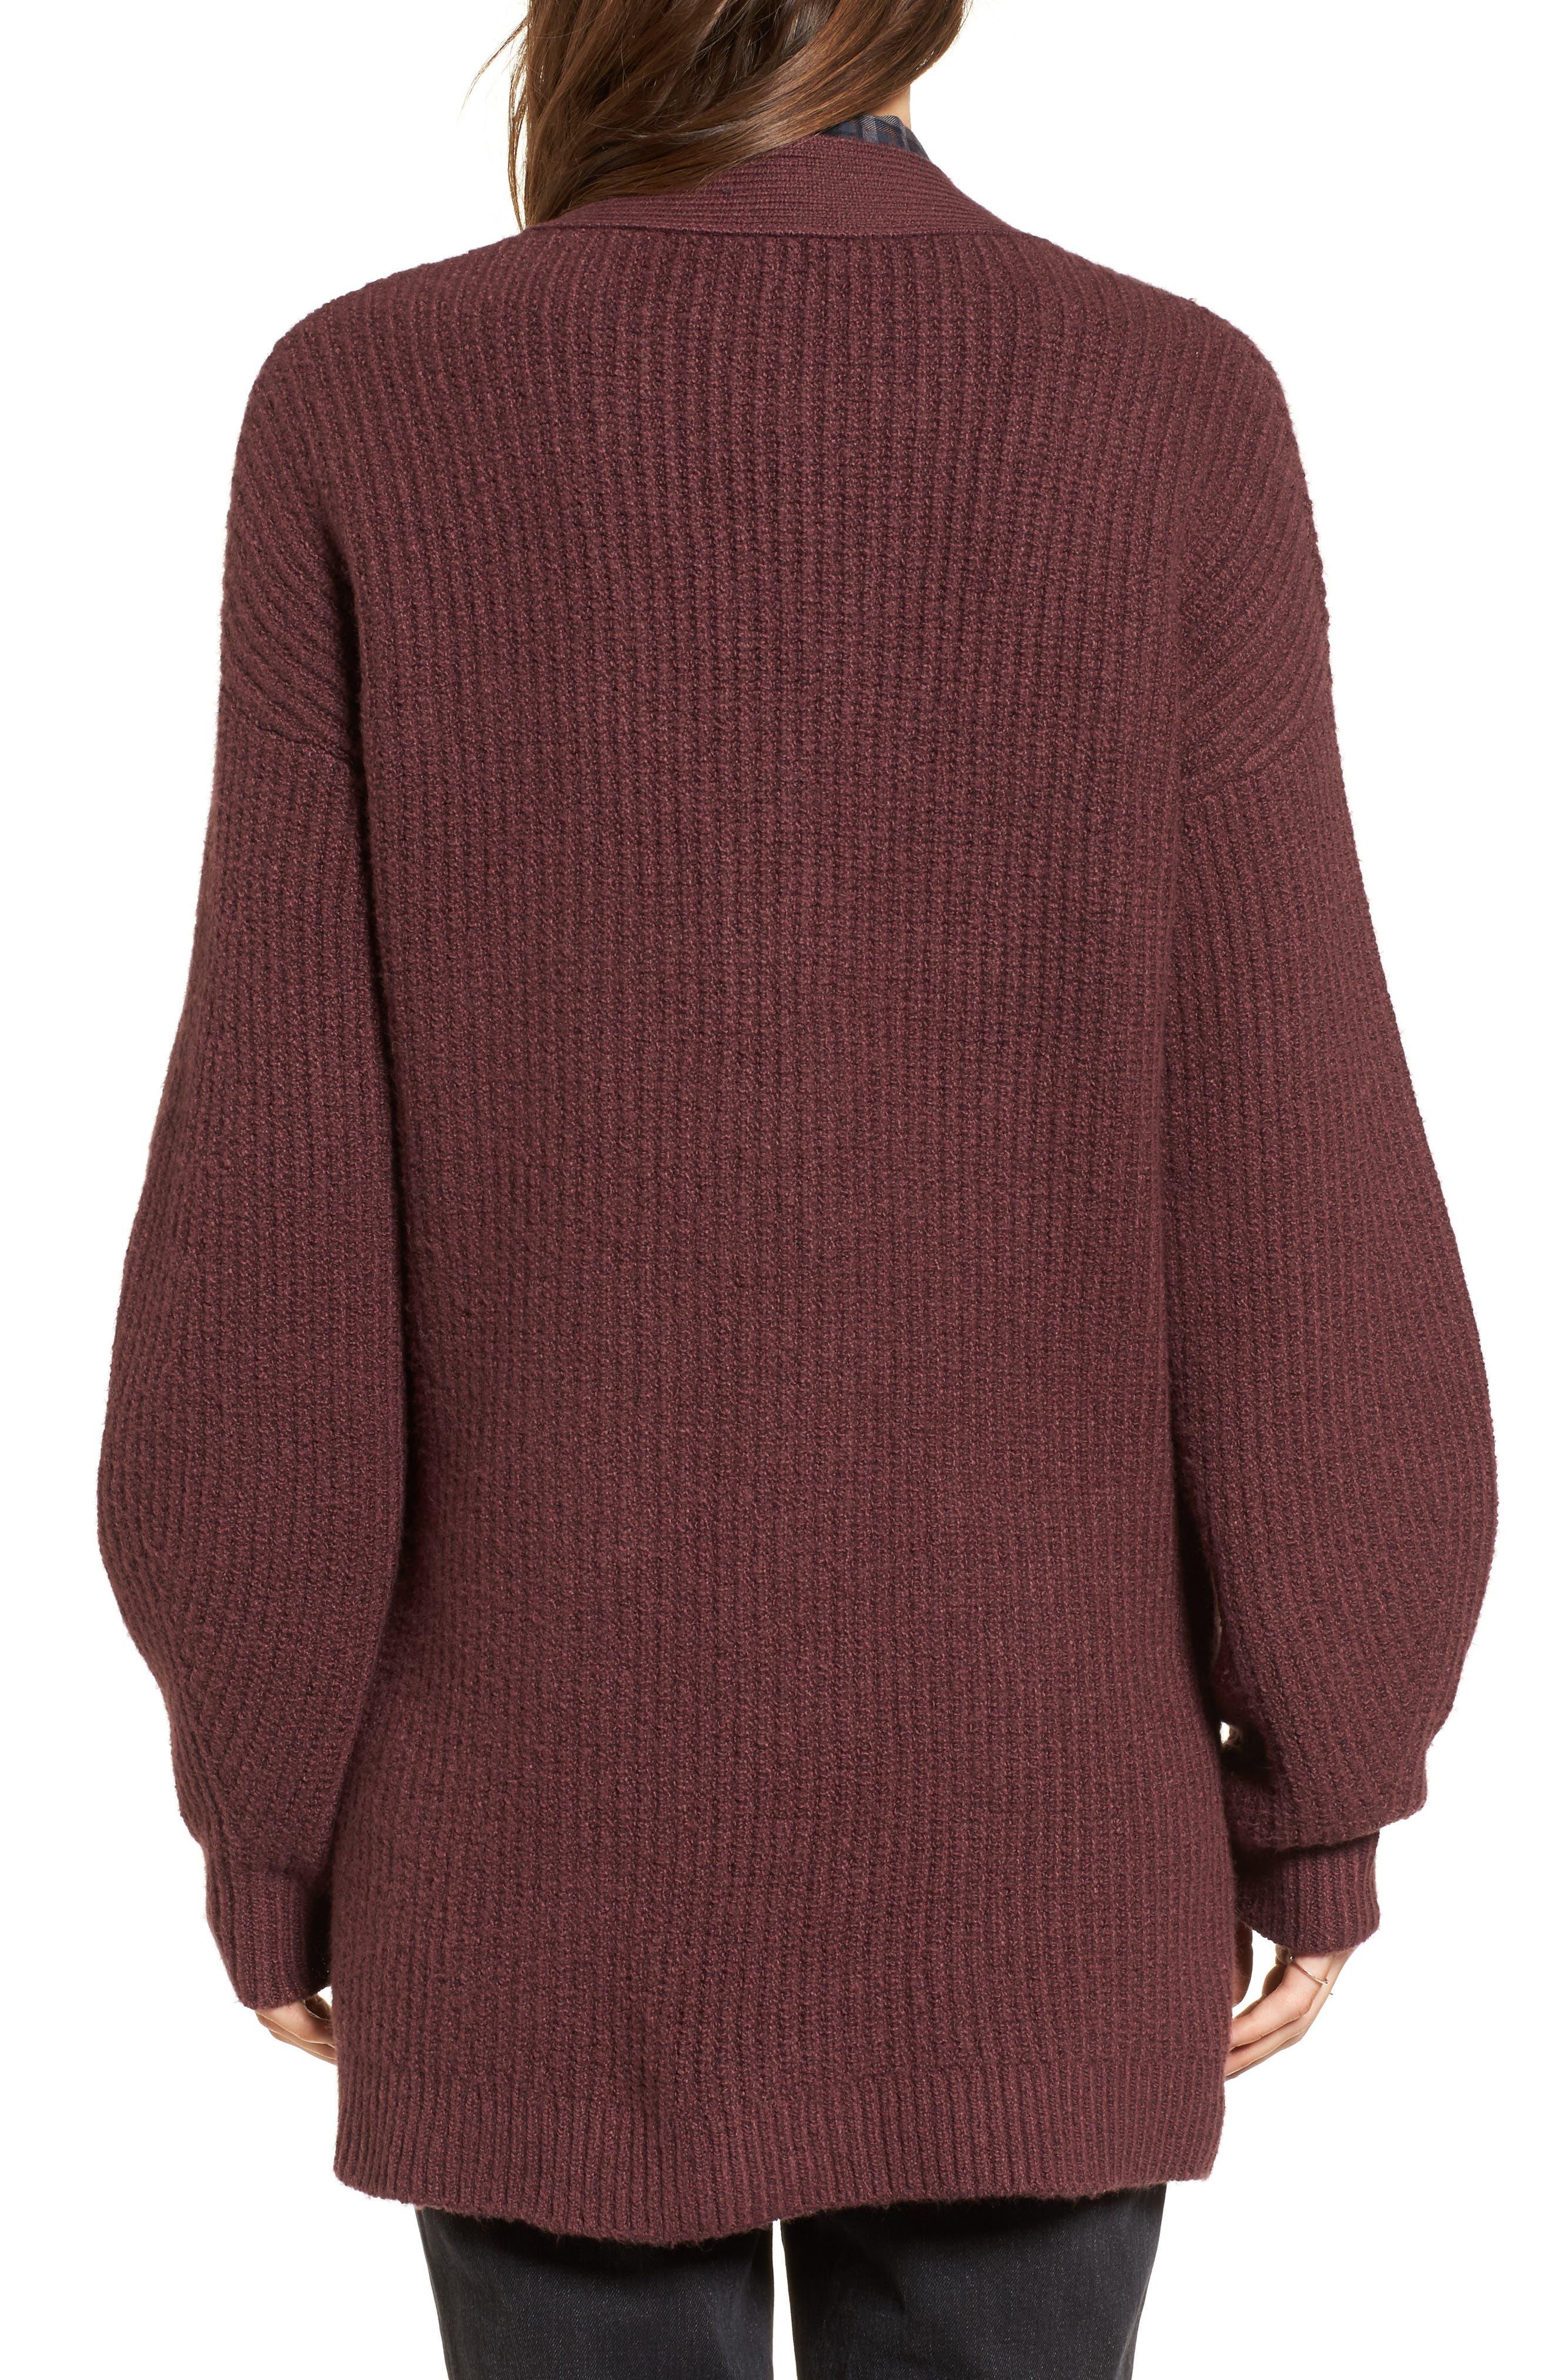 Ribbed Cardigan Sweater,                             Alternate thumbnail 2, color,                             930